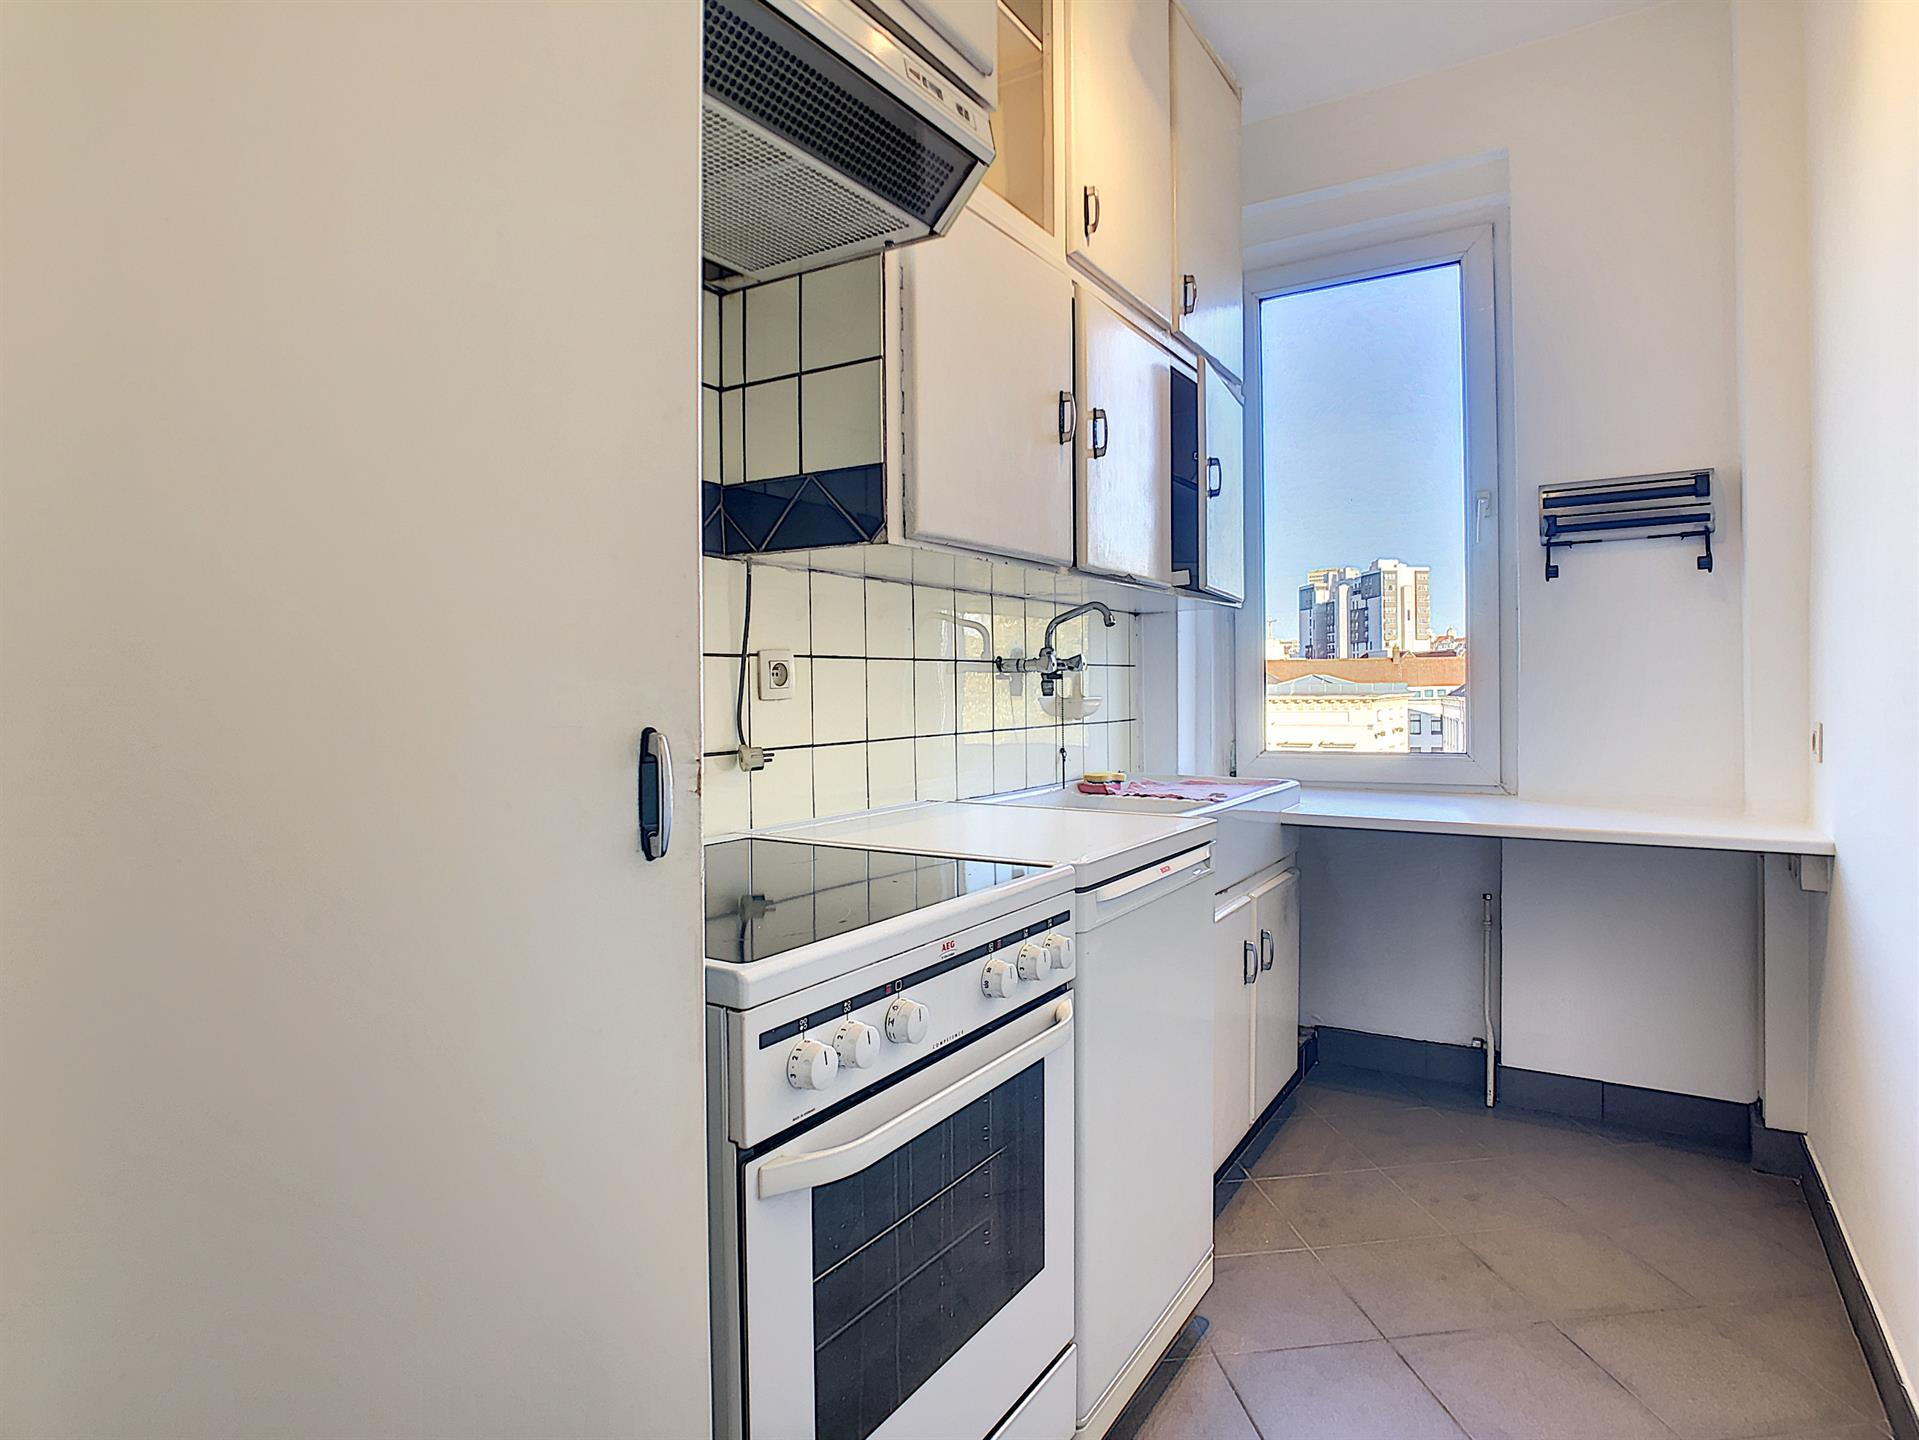 Appartement - Sint-Gillis - #4202152-2